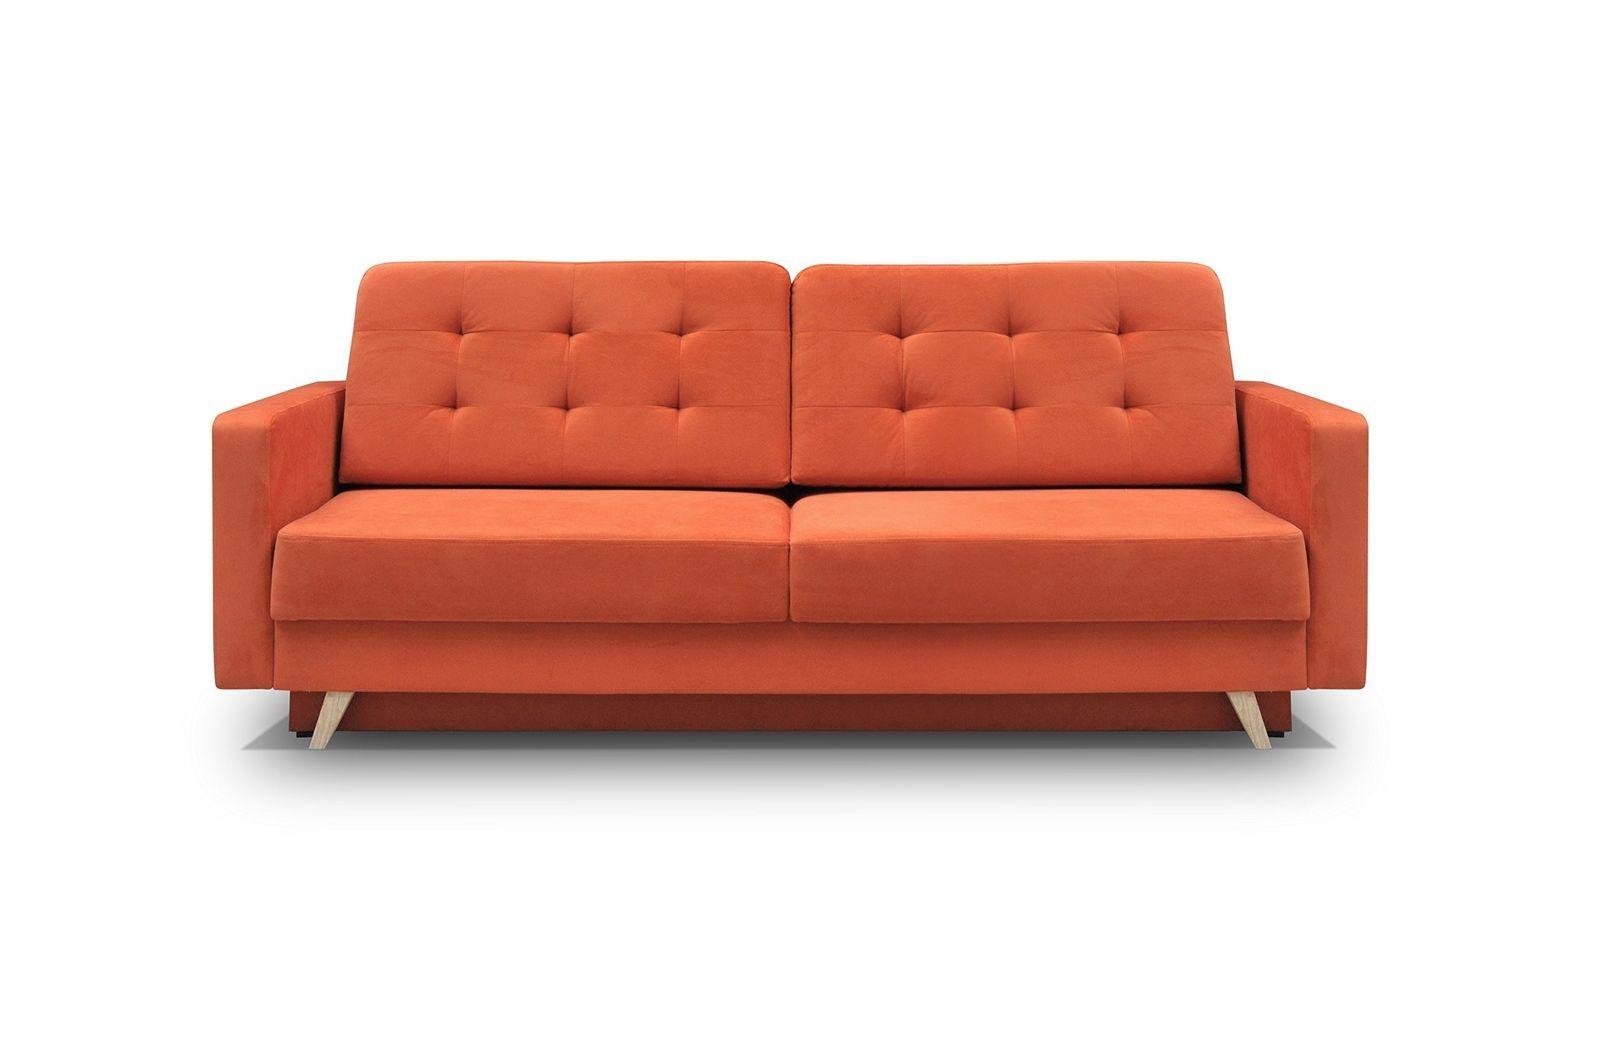 vegas futon sectional sofa bed queen sleeper with storage sandhill 7 piece outdoor set seats orange